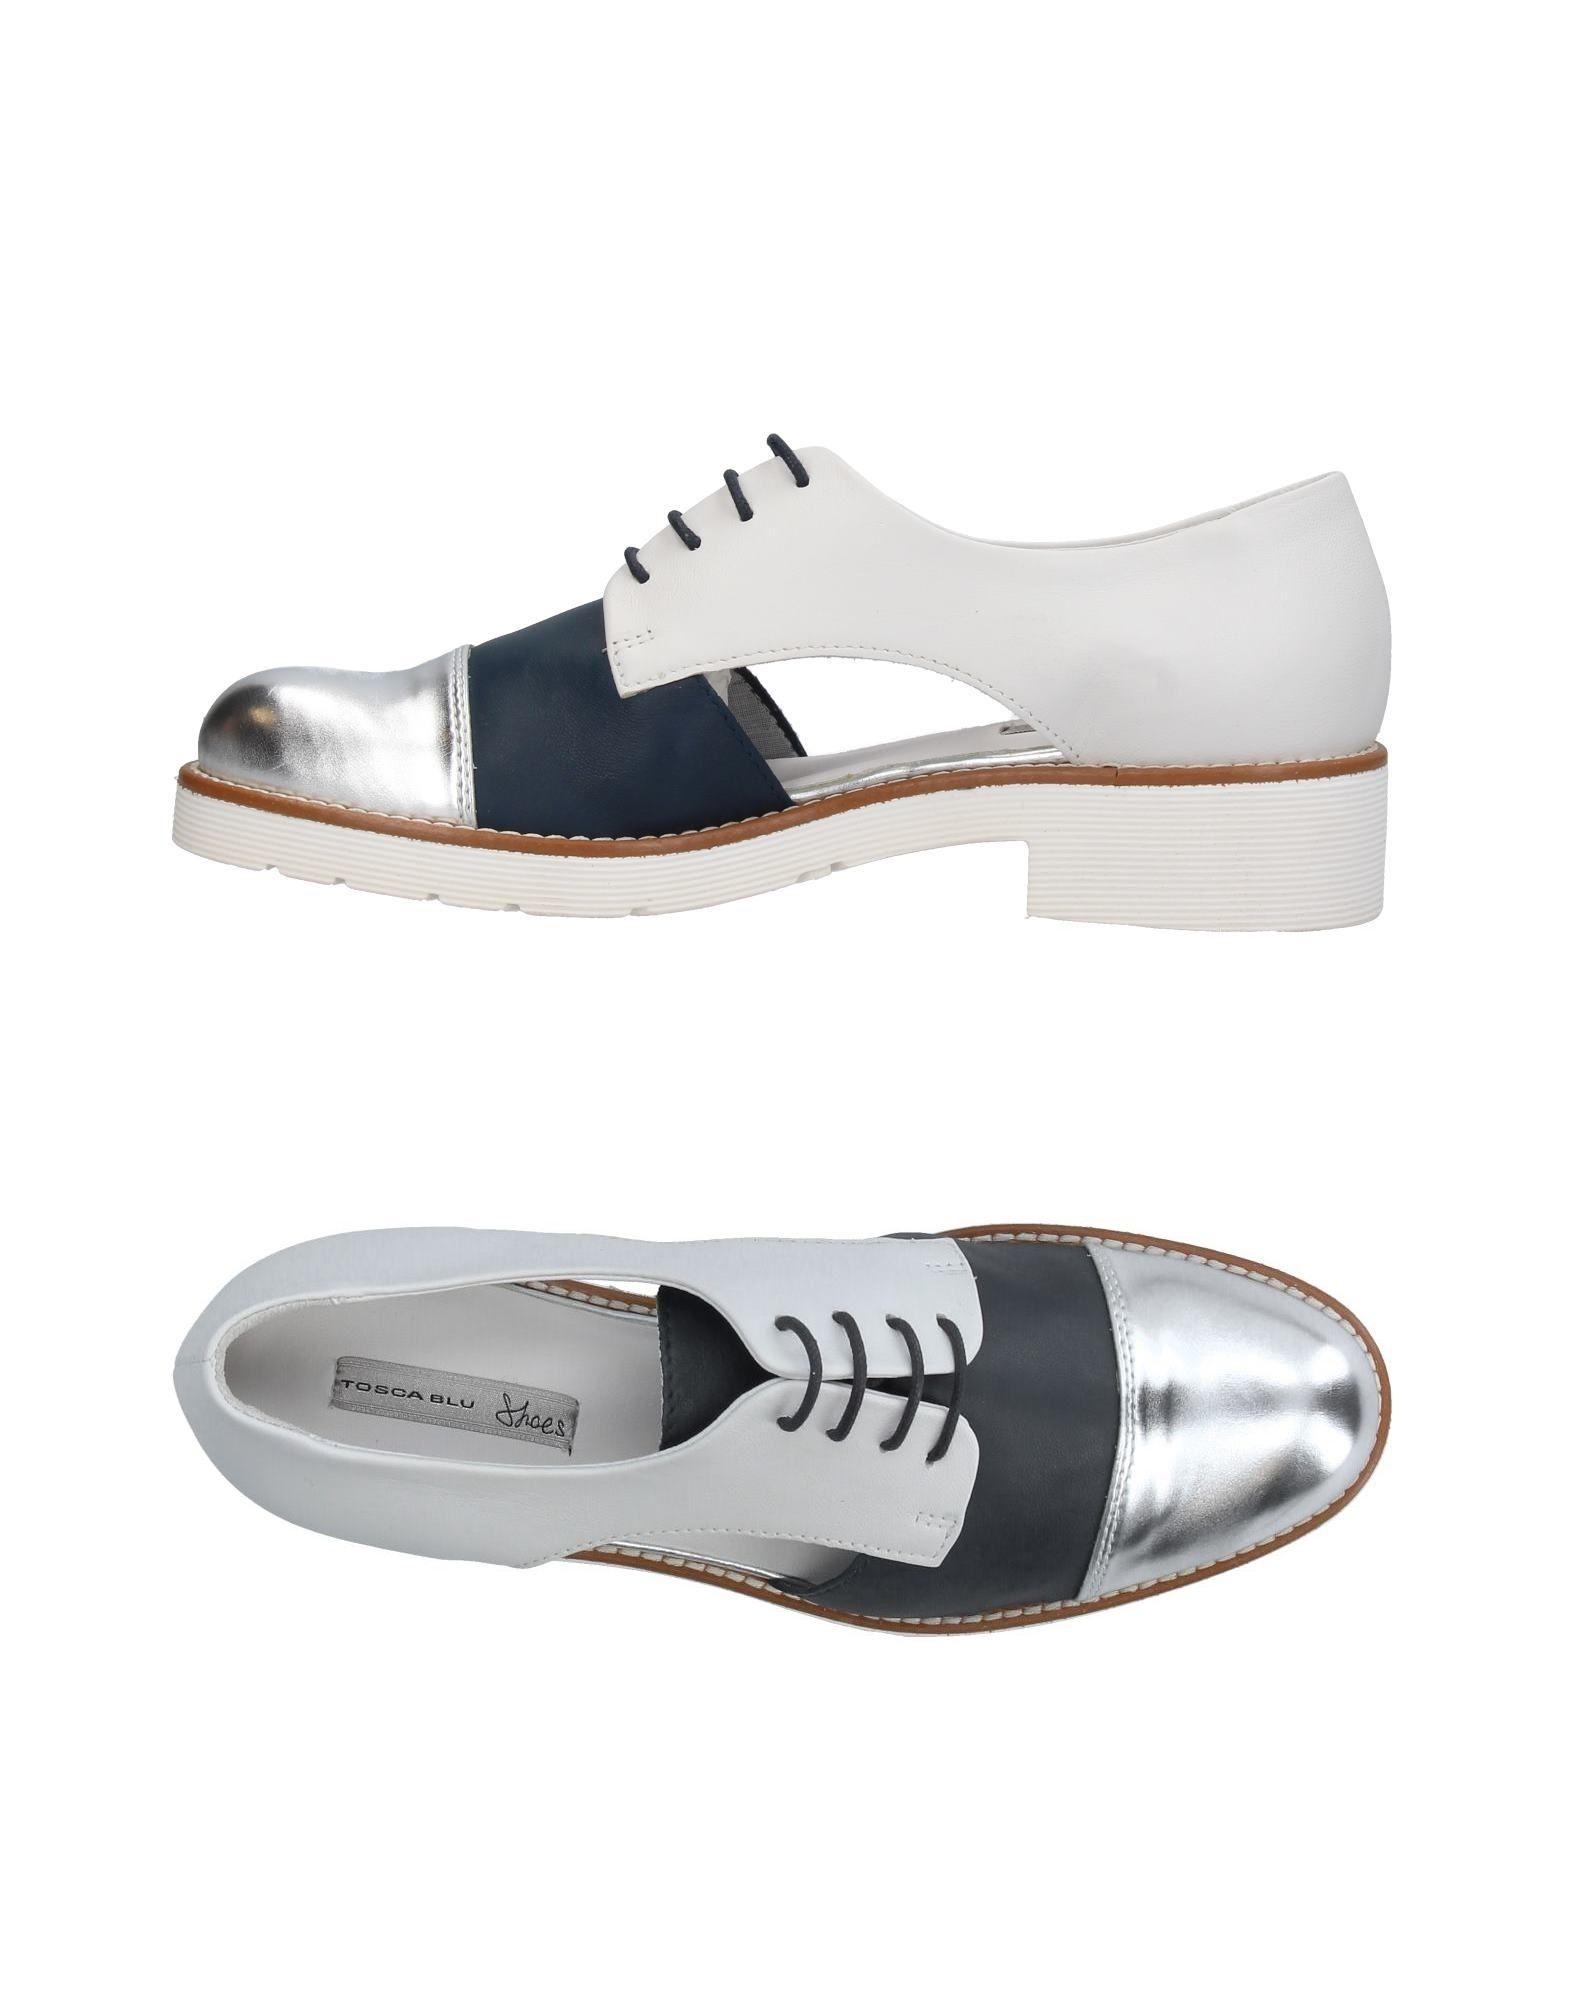 Stringate Tosca Blu Donna Shoes Donna Blu - 11368440AG 6efa1e